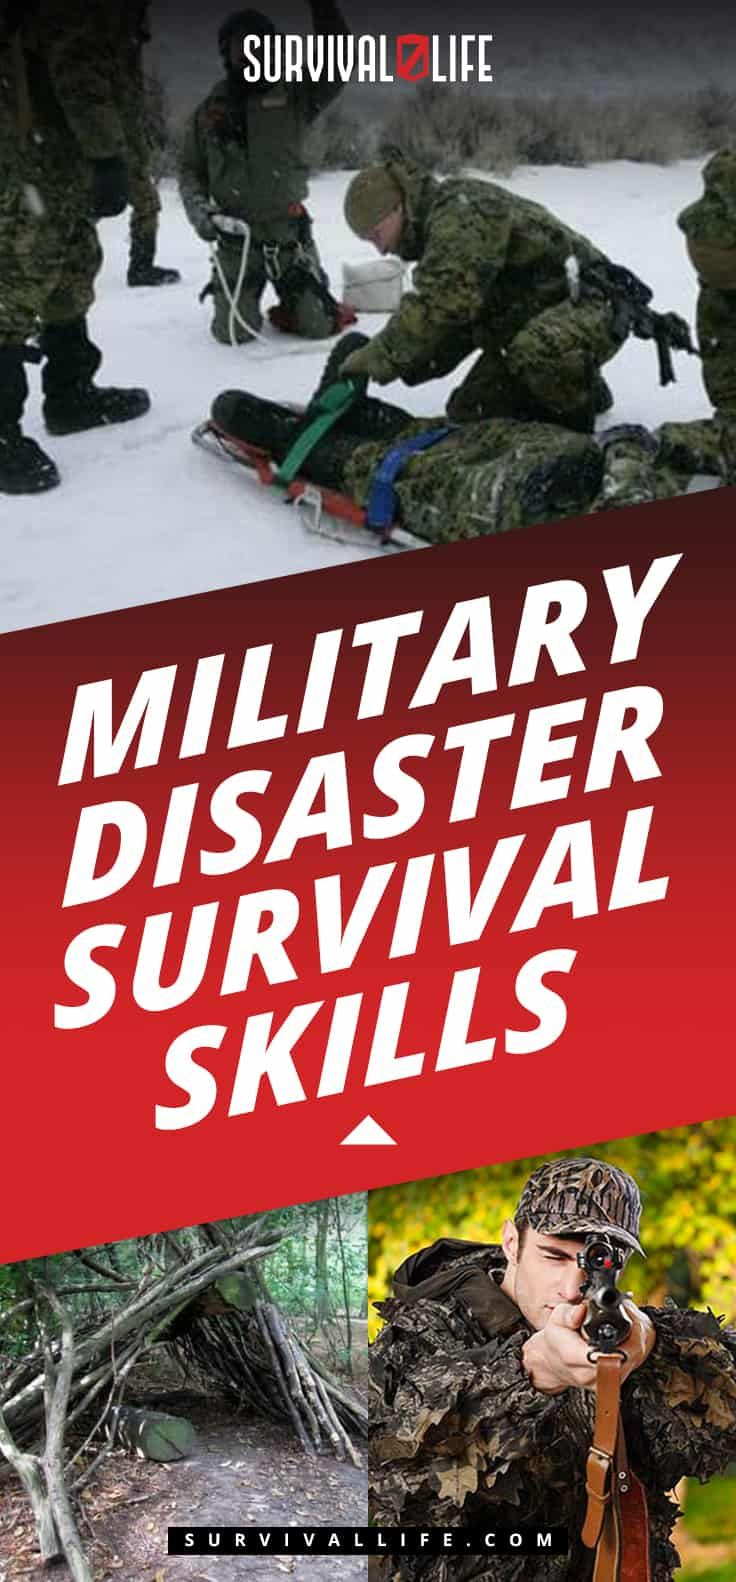 Military Disaster Survival Skills | Survival Life